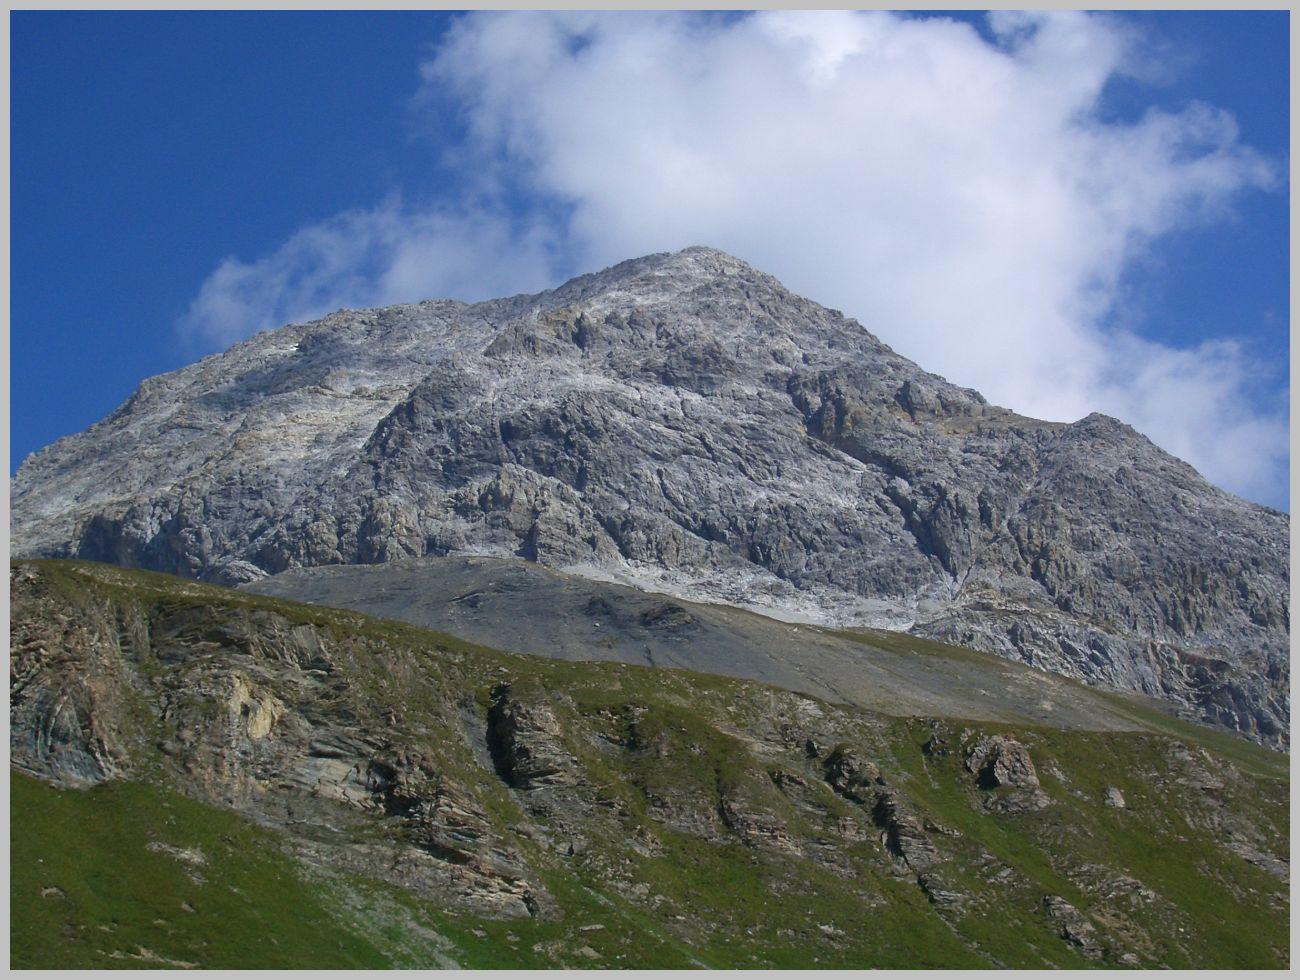 200908_Moped_Alpentour001